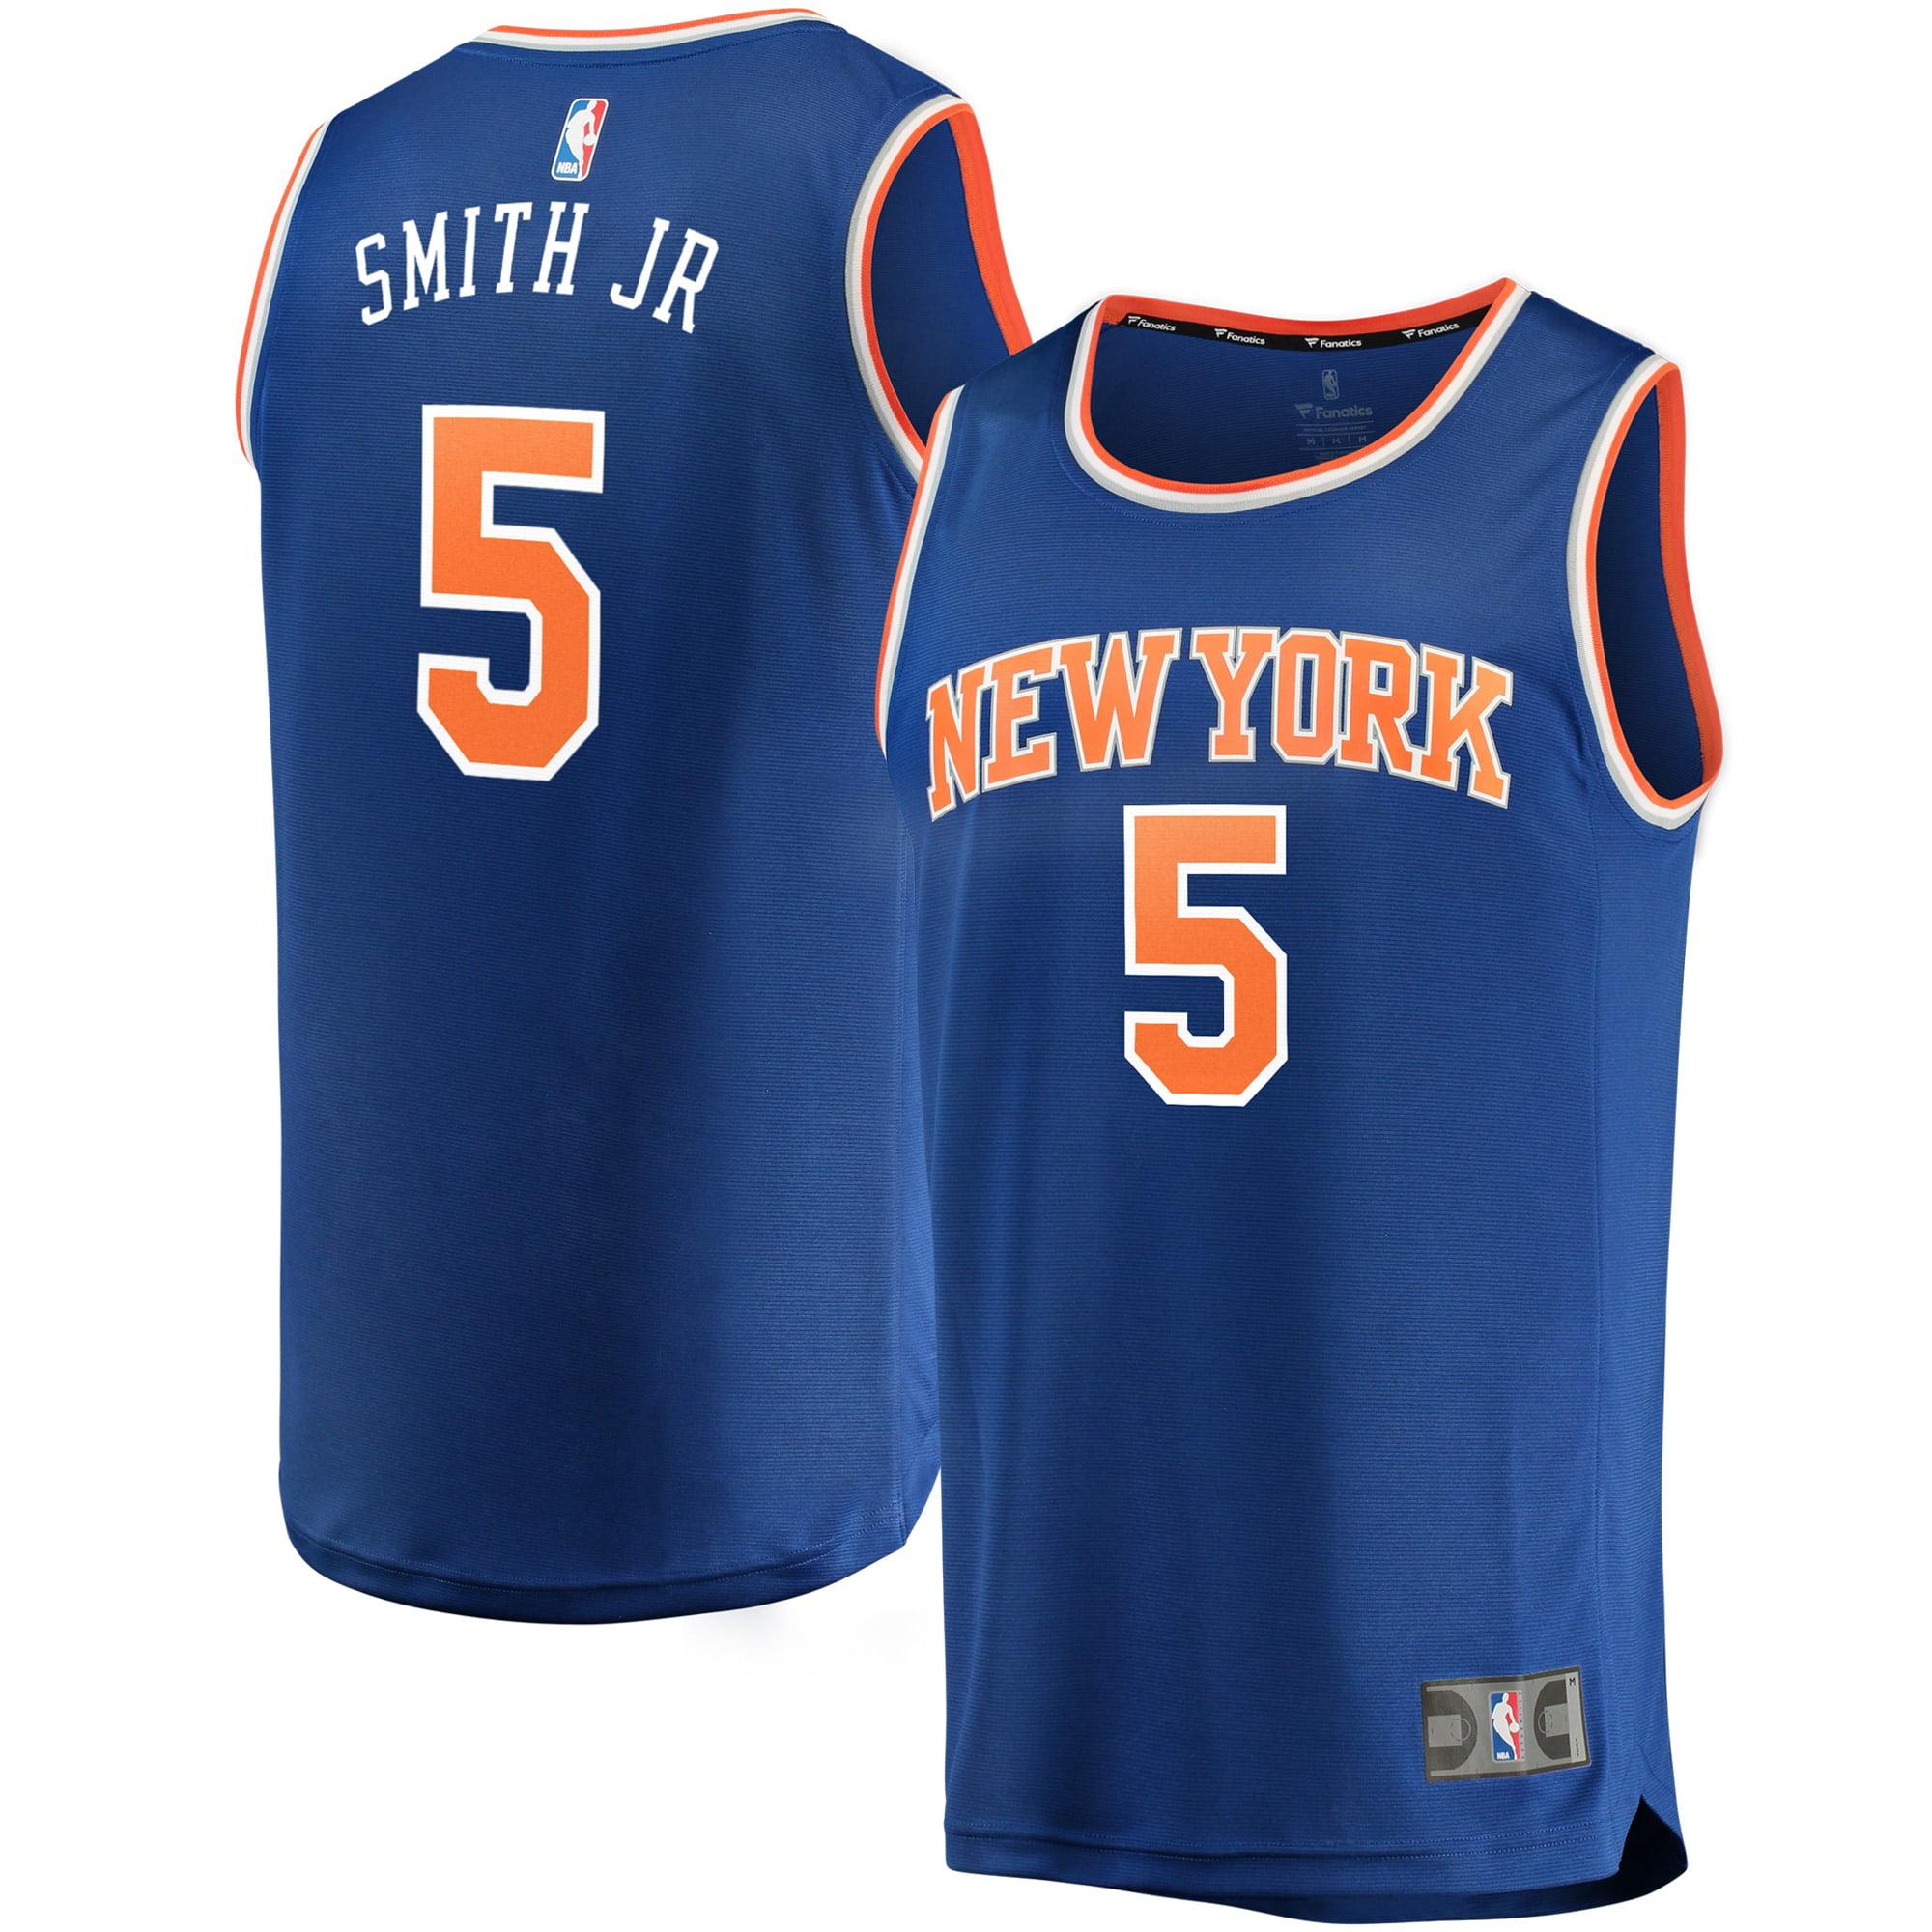 Fanatics - JR Smith New York Knicks Fanatics Branded Youth Fast Break Replica Jersey Royal - Icon Edition - Walmart.com